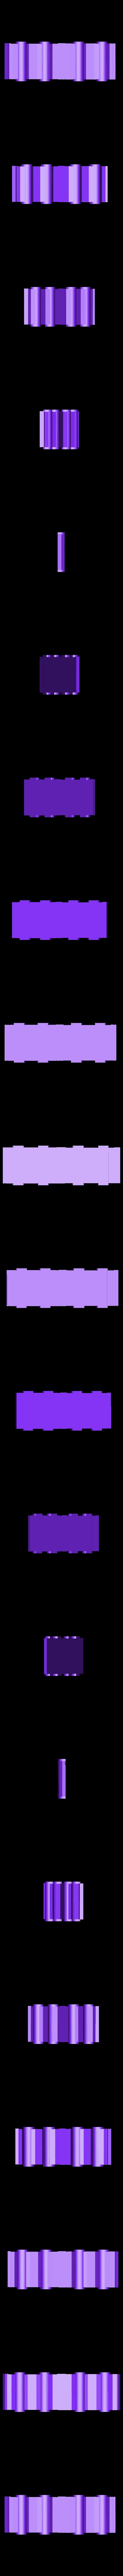 base.stl Download free STL file KustomWagon (blown apart) • 3D printable object, Savex